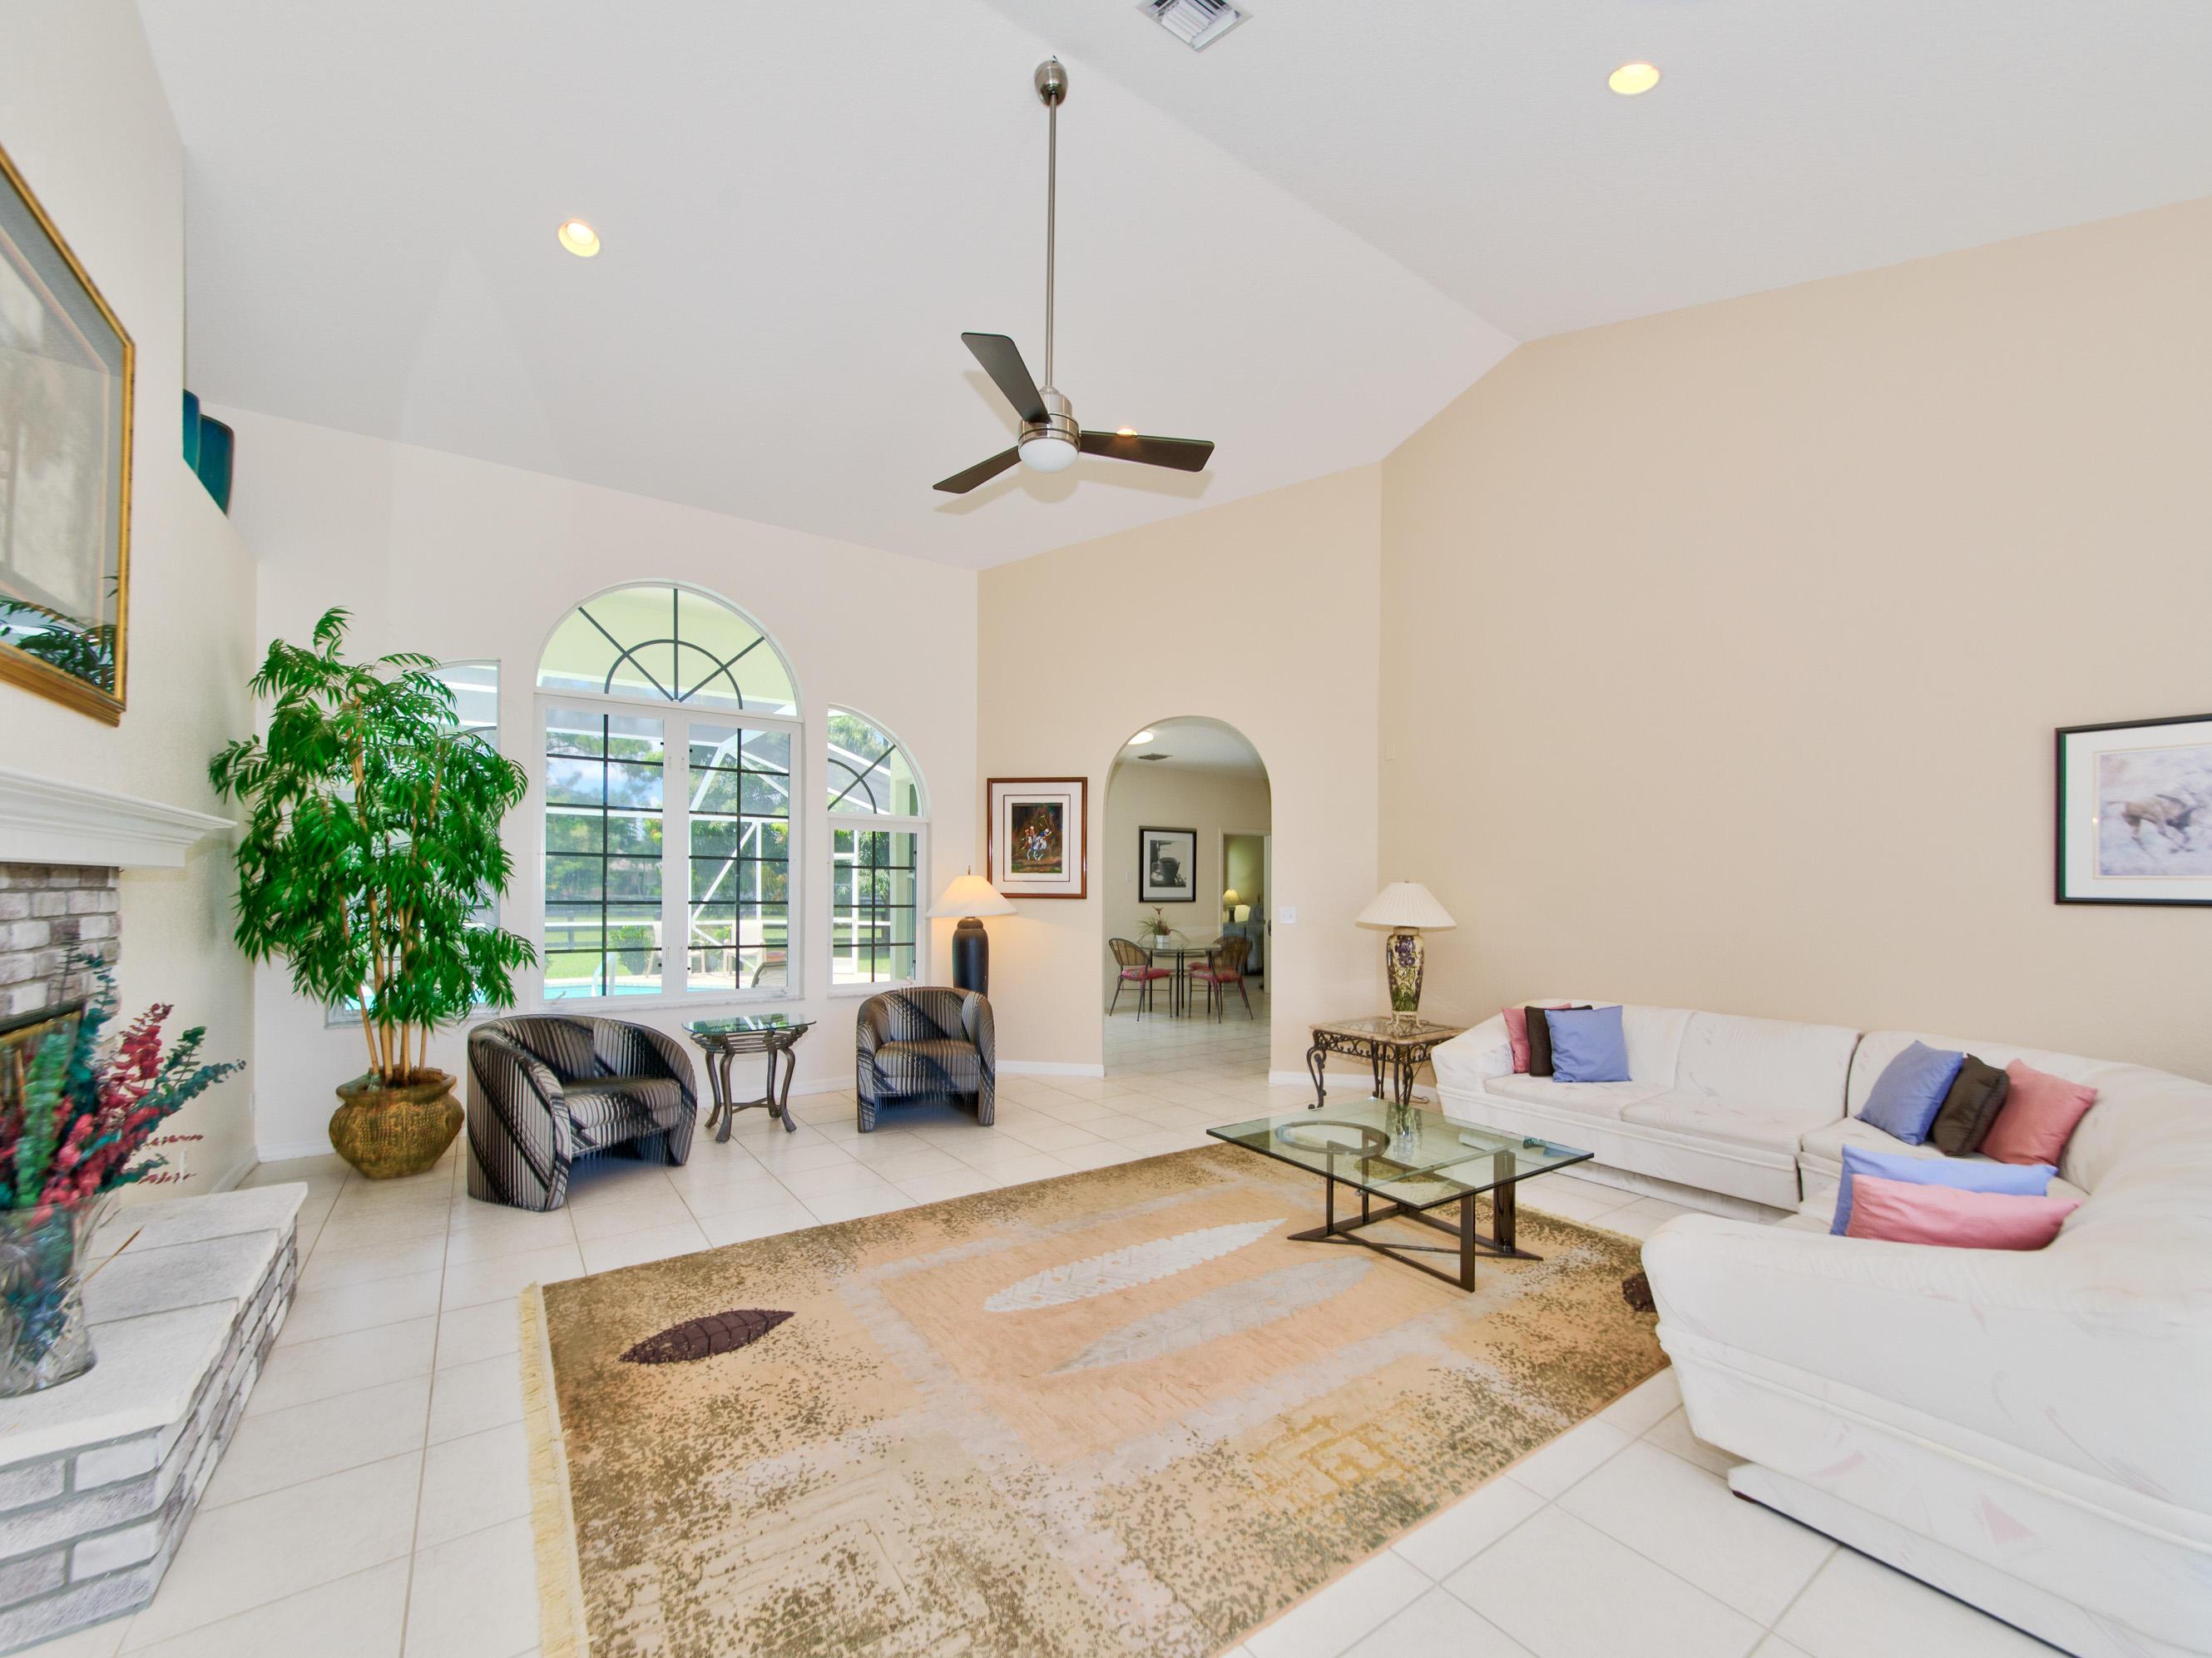 14371 Wellington Trace, Wellington, Florida 33414, 4 Bedrooms Bedrooms, ,2.1 BathroomsBathrooms,Single Family,For Sale,Wellington,RX-10284426